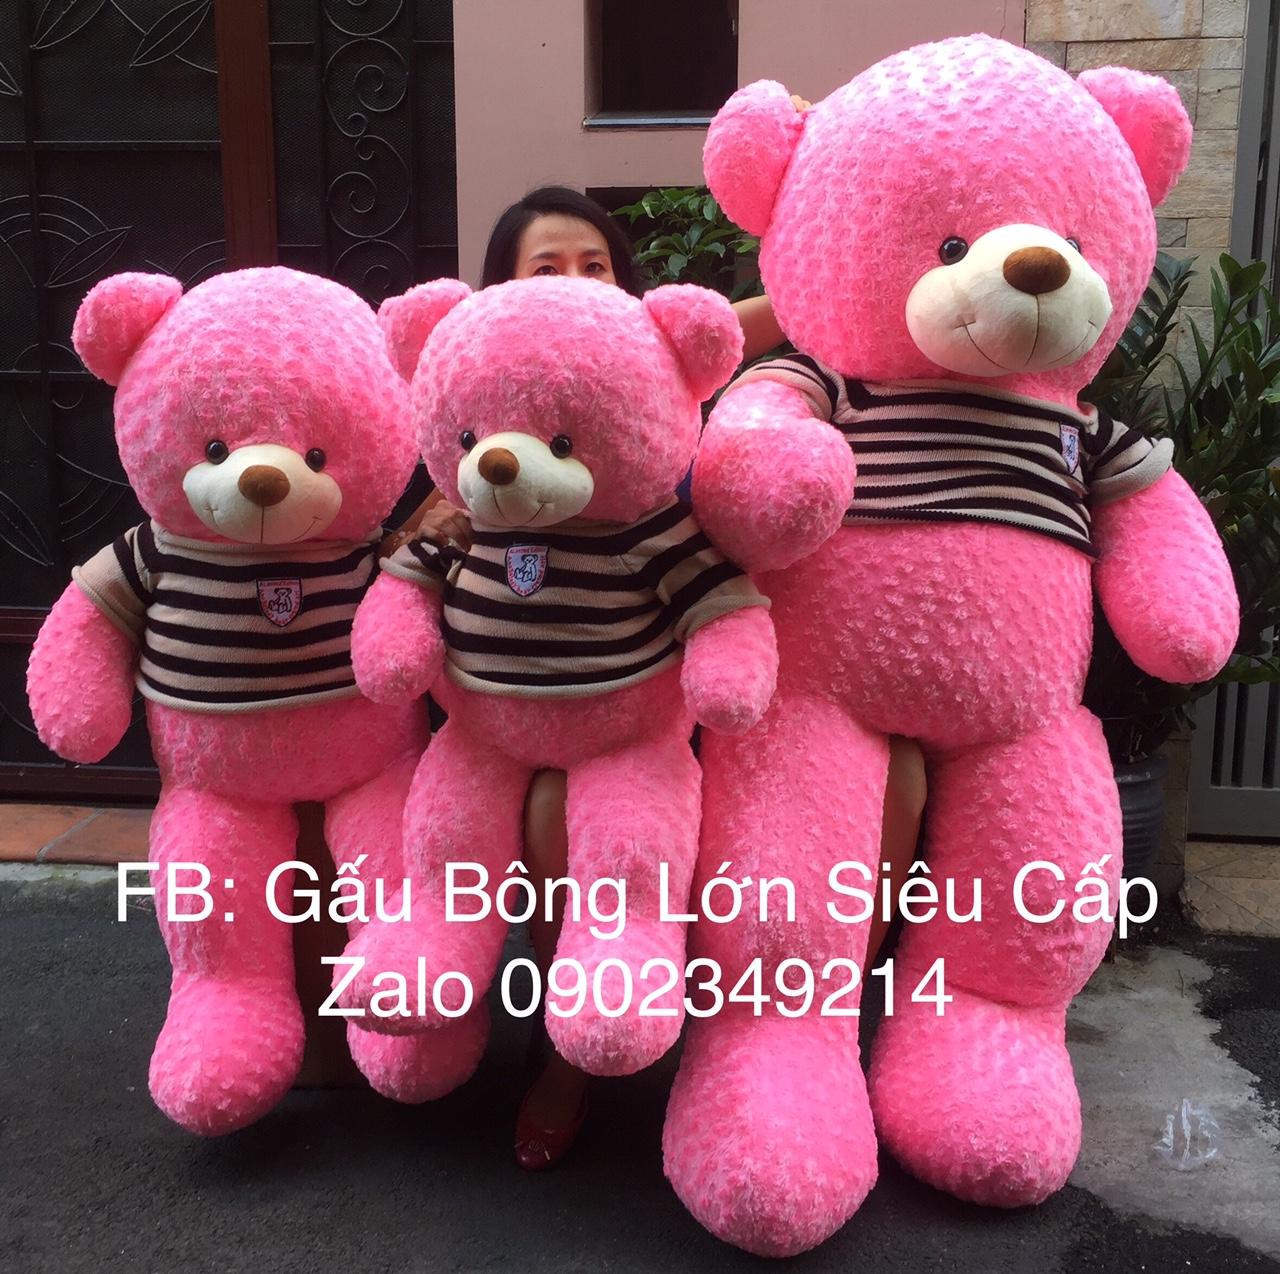 Gấu teddy to VNXK mặt cực xinh 1m6